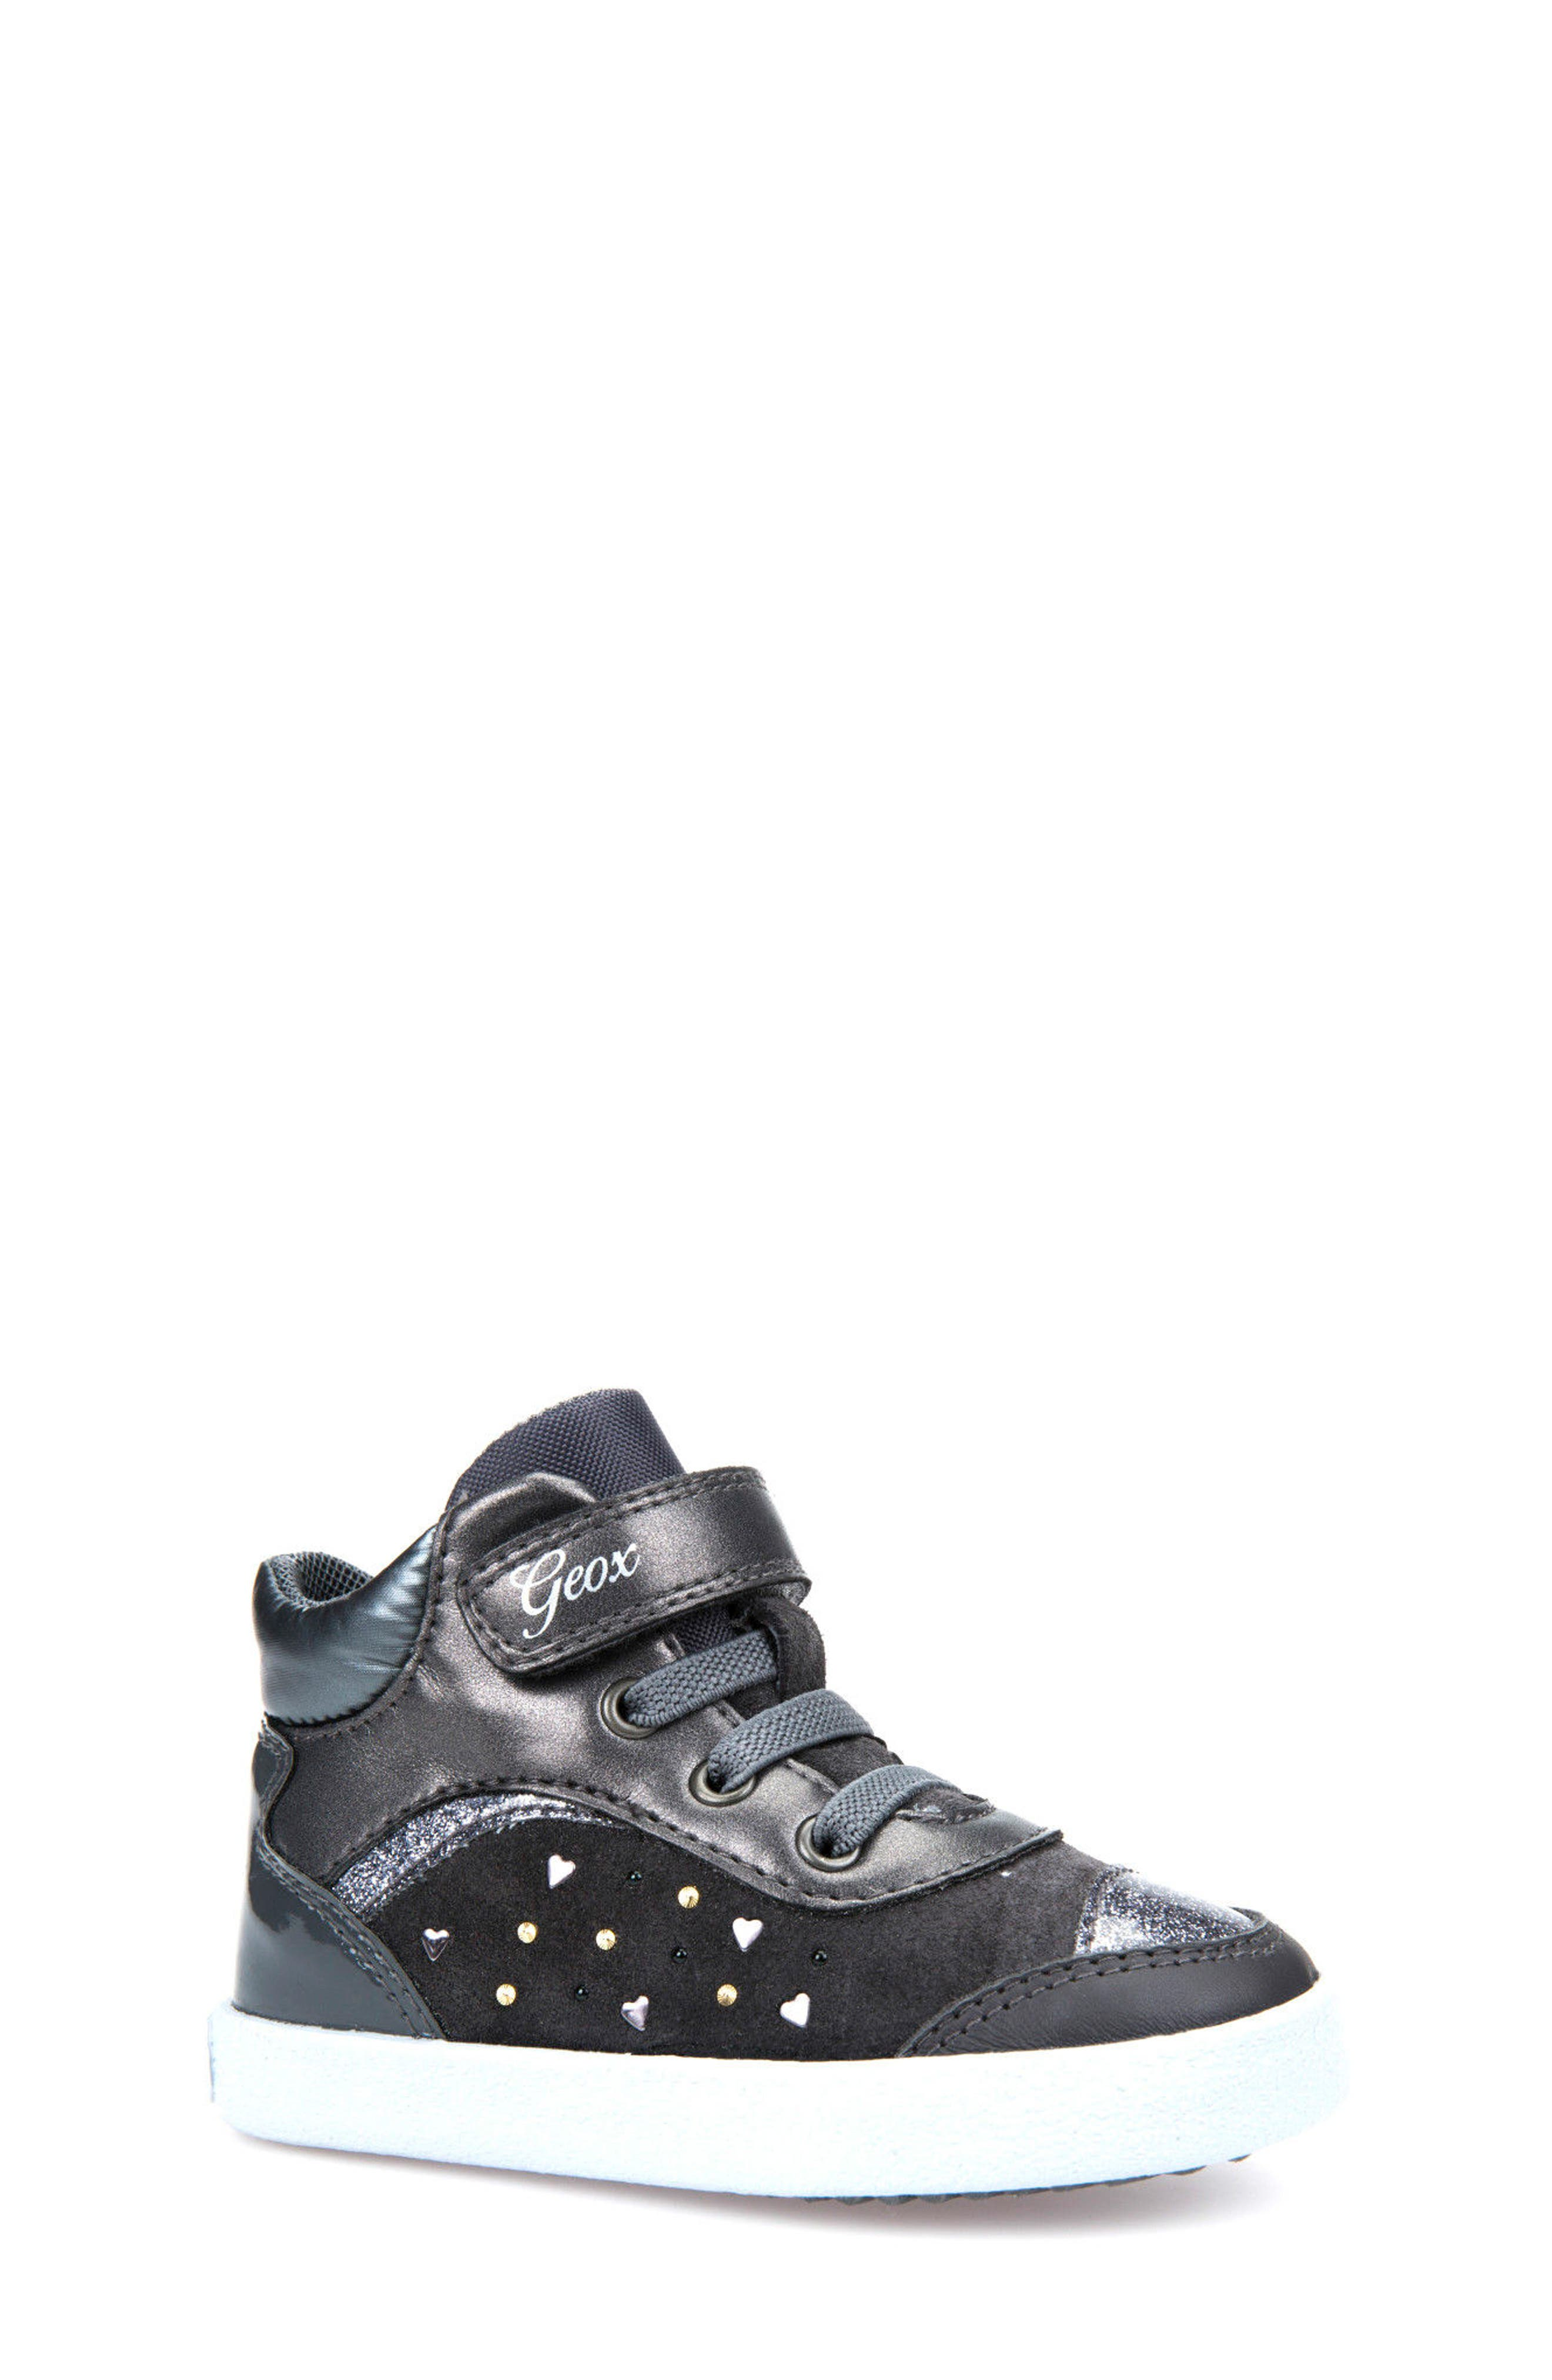 Kiwi Girl Studded High Top Sneaker,                             Main thumbnail 2, color,